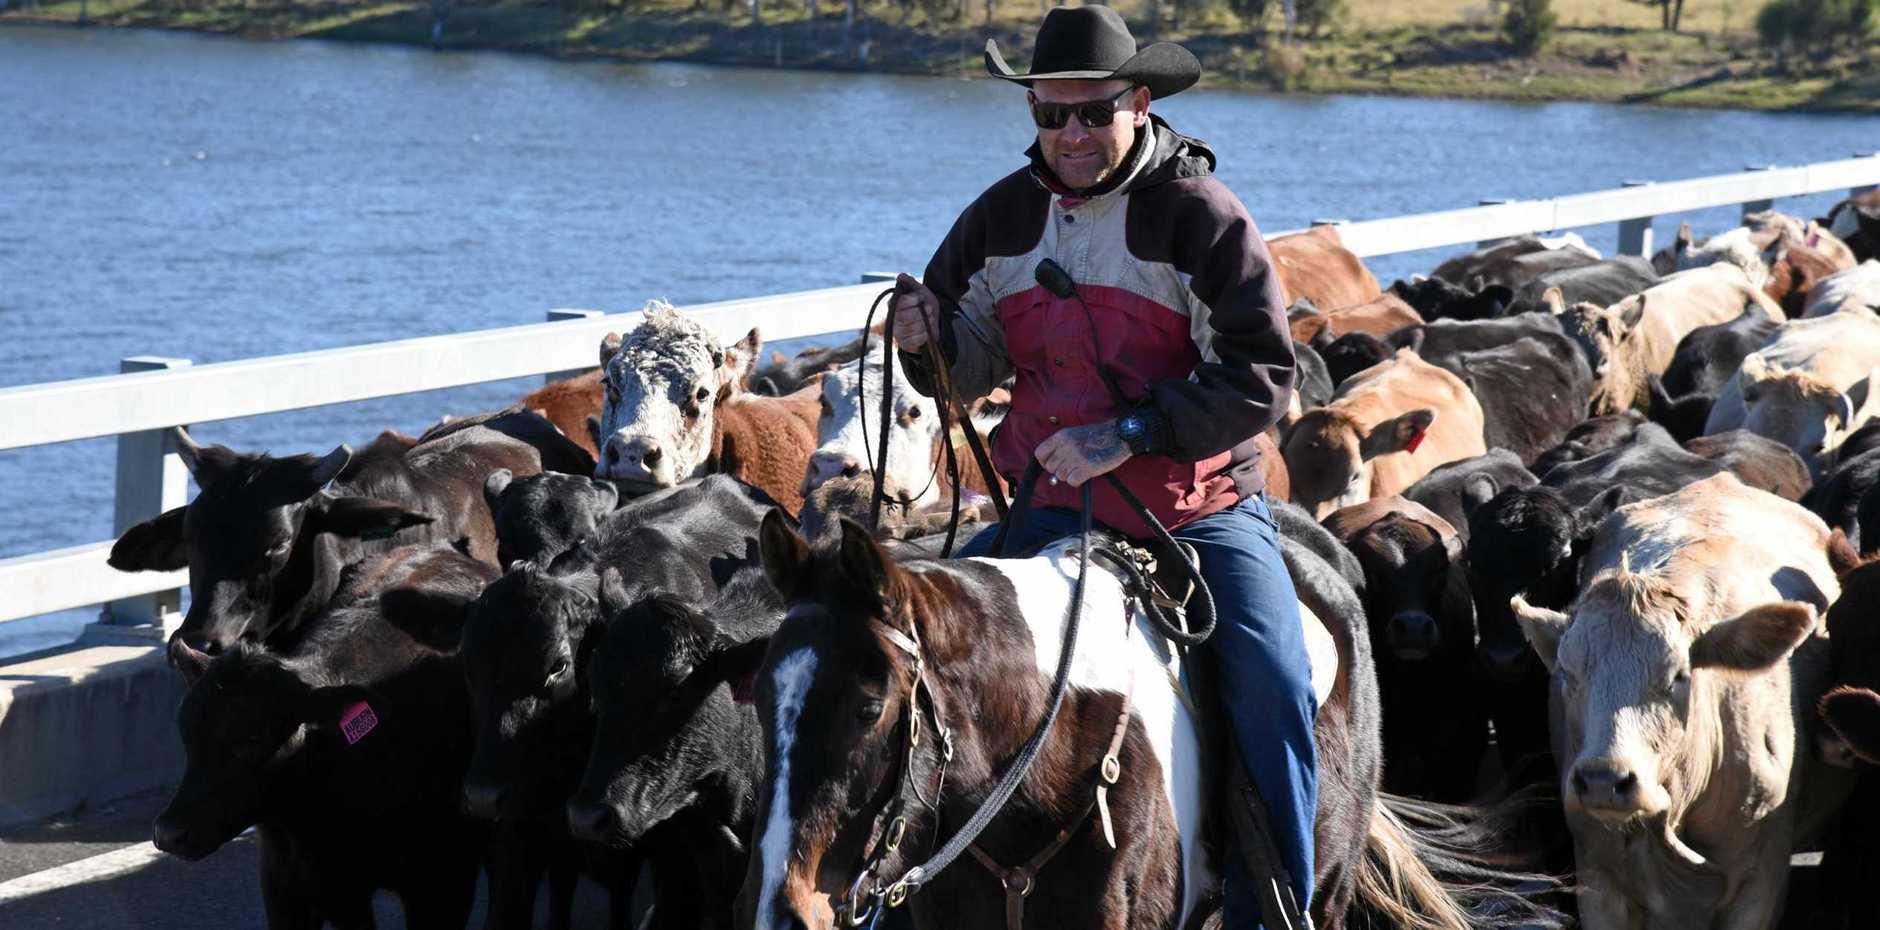 BRIDGE OF BOVINES: Drover Shaun Moffitt leading his herd across Mingo Crossing Bridge on Monday, July 15.